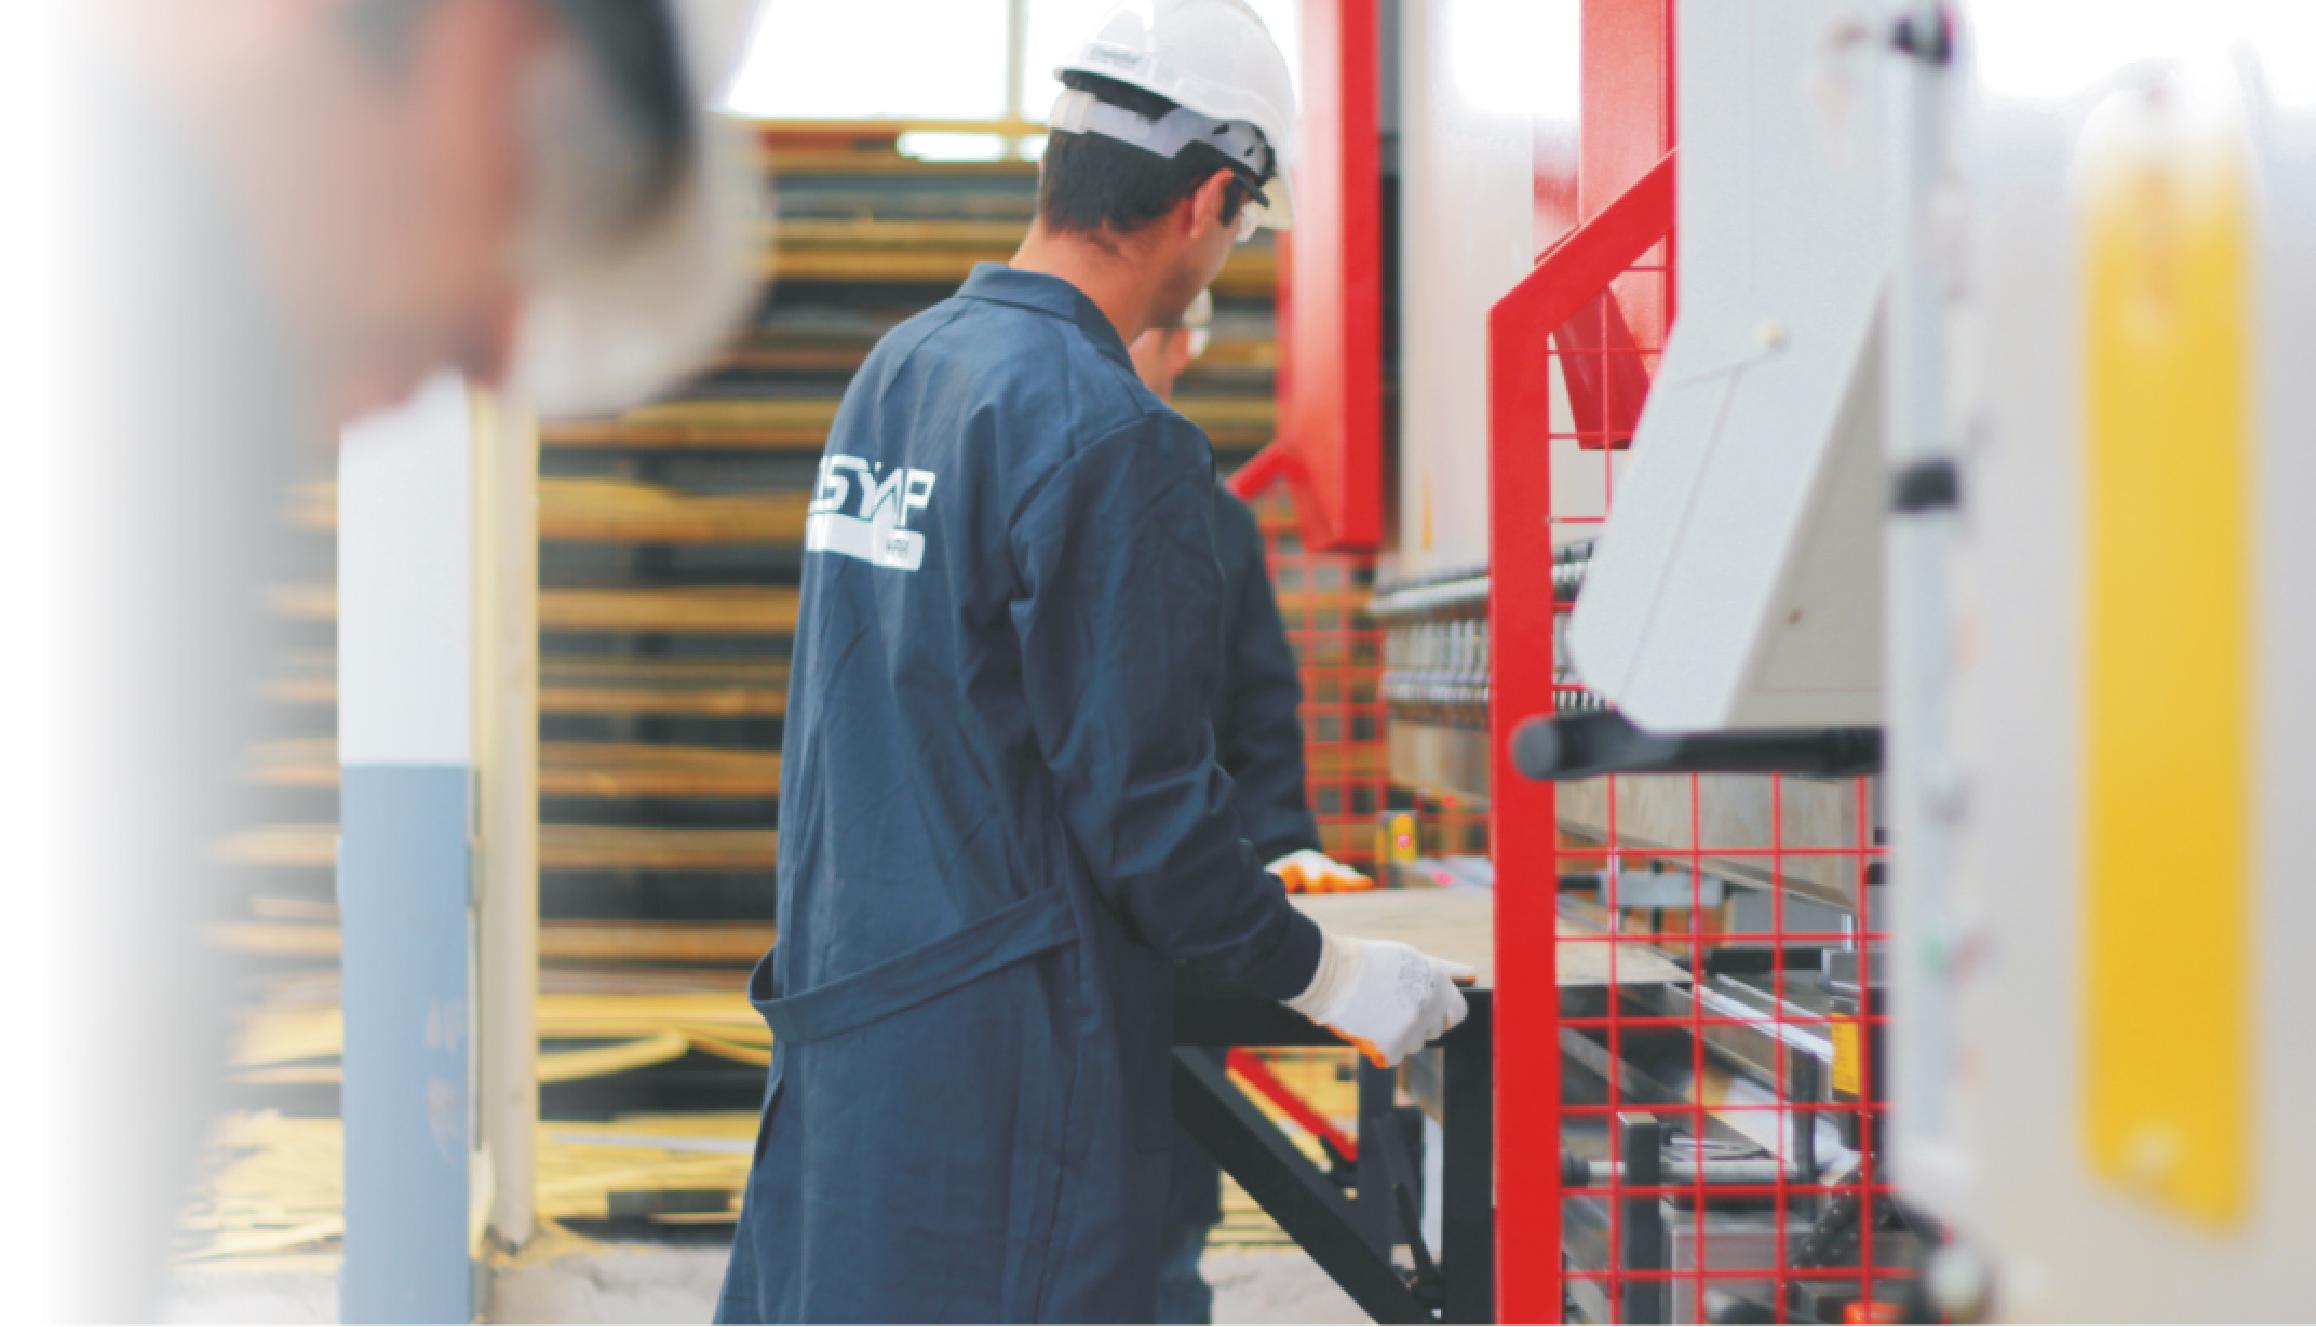 Osyap Fabrika İmalathane - Çorum Dörtçelik Konteyner Metal Pvc İnşaat